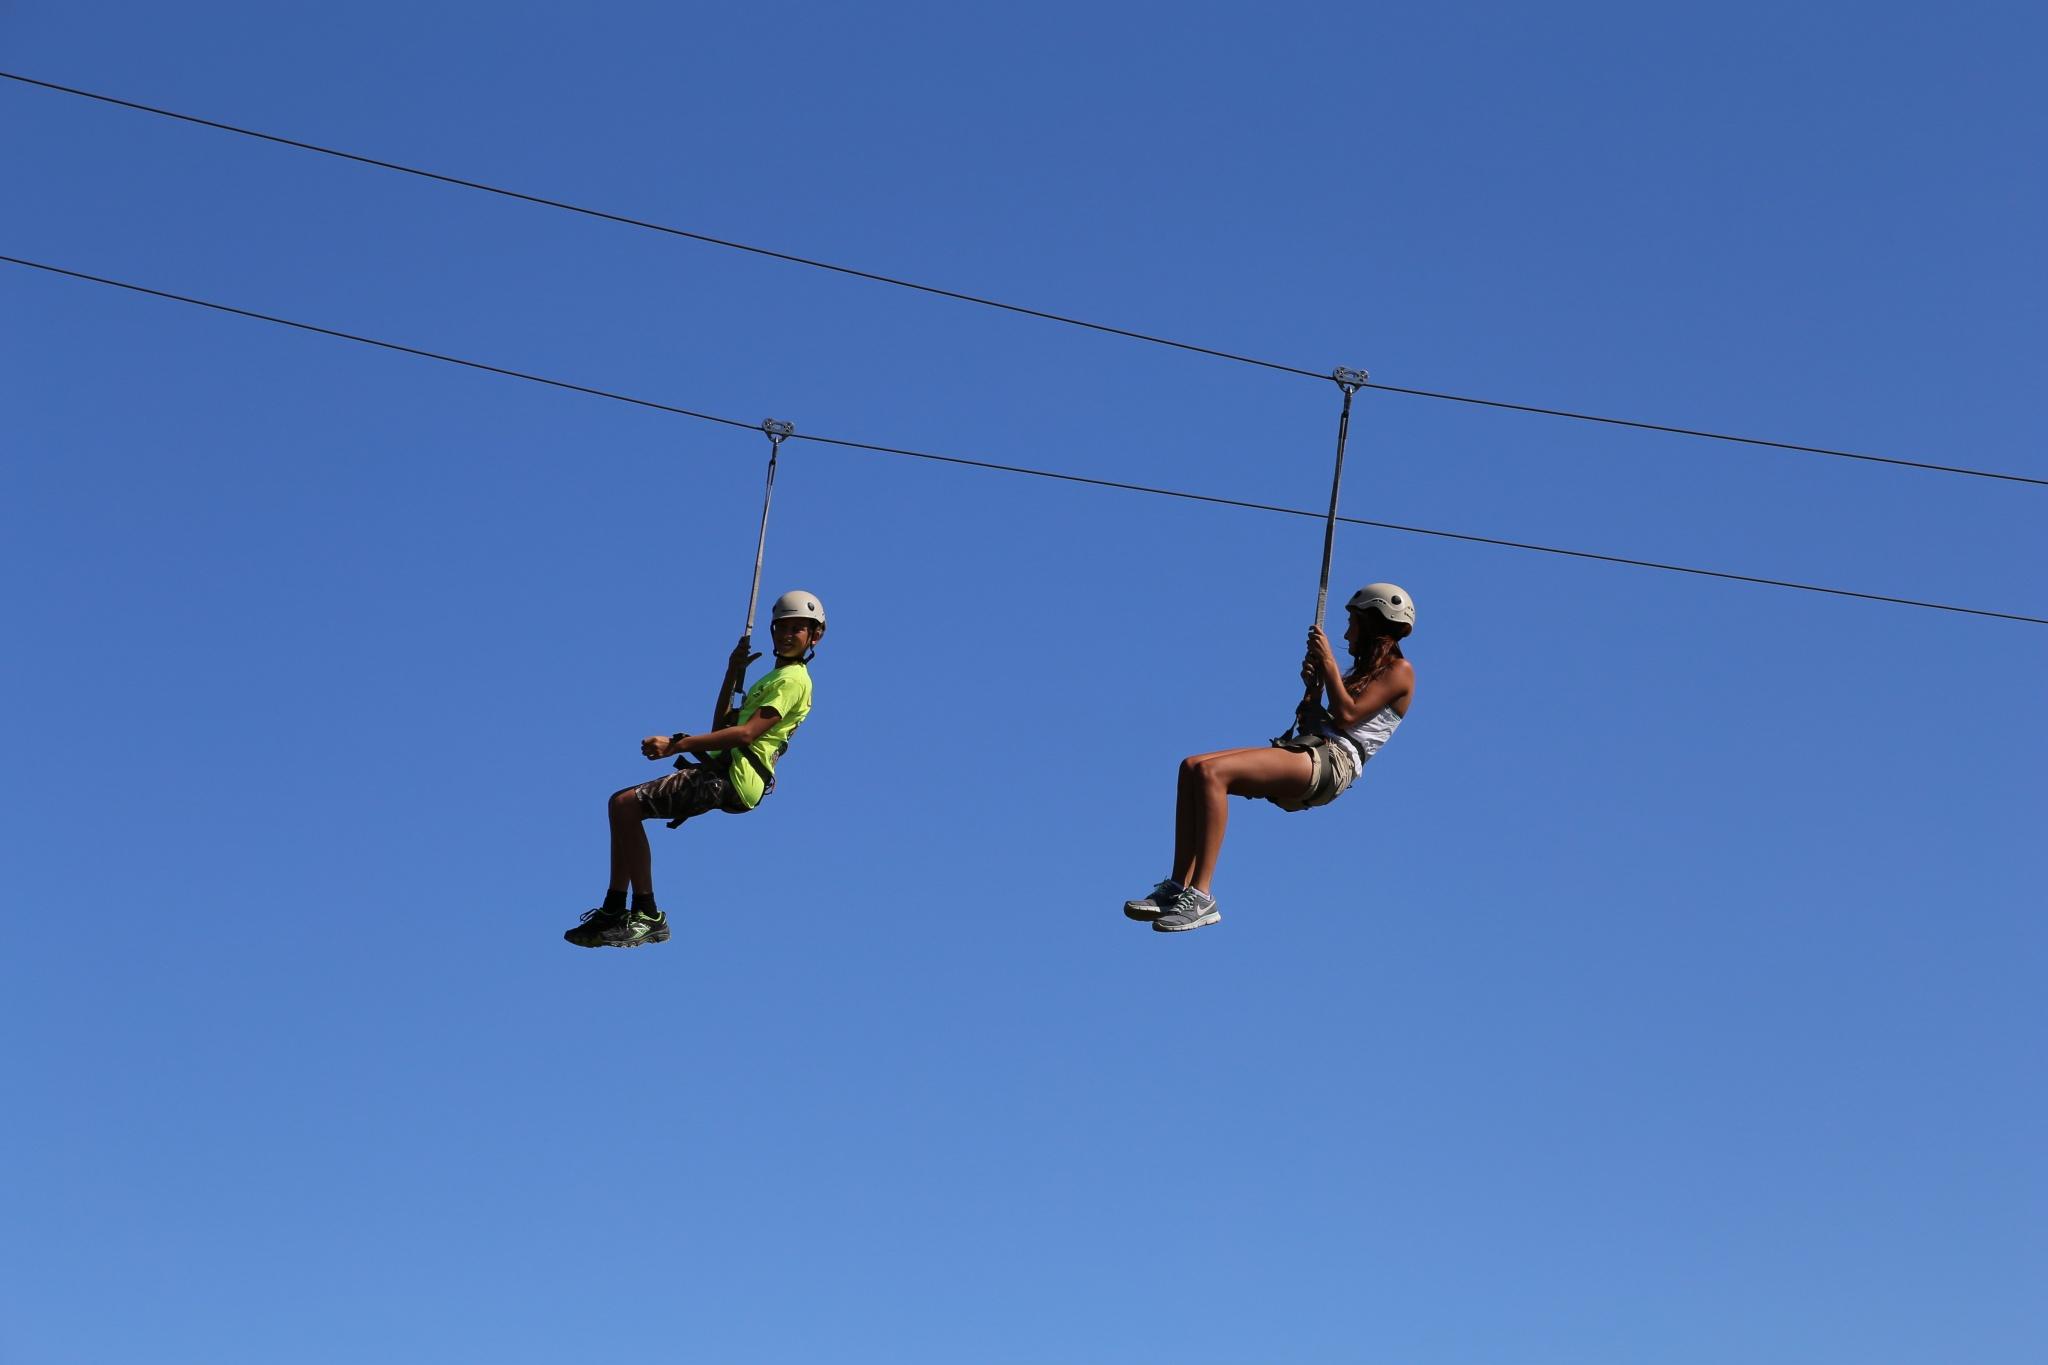 two adults on a zipline